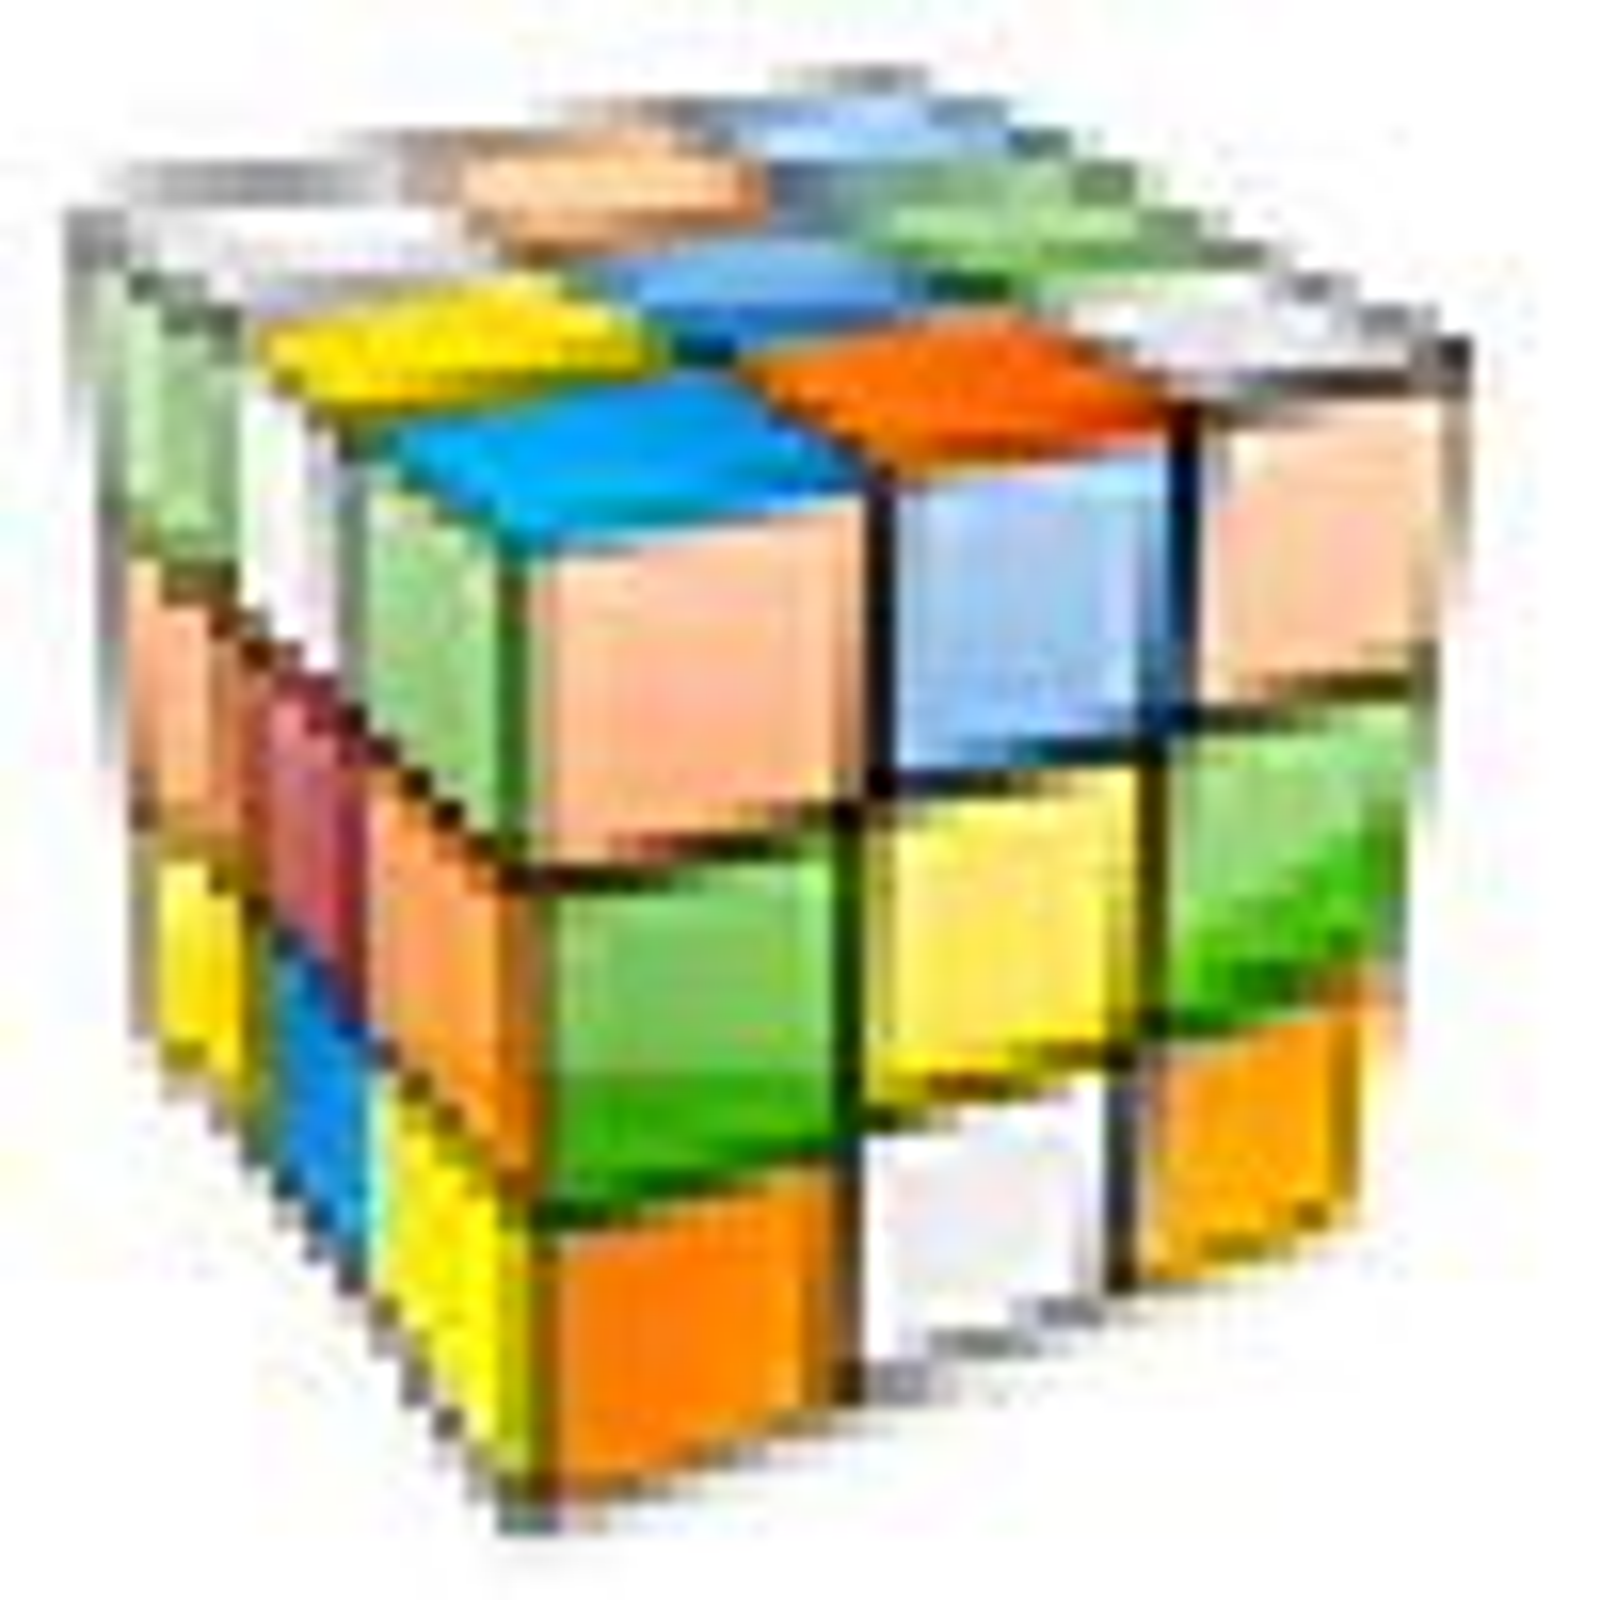 PlayBox 1.5.4